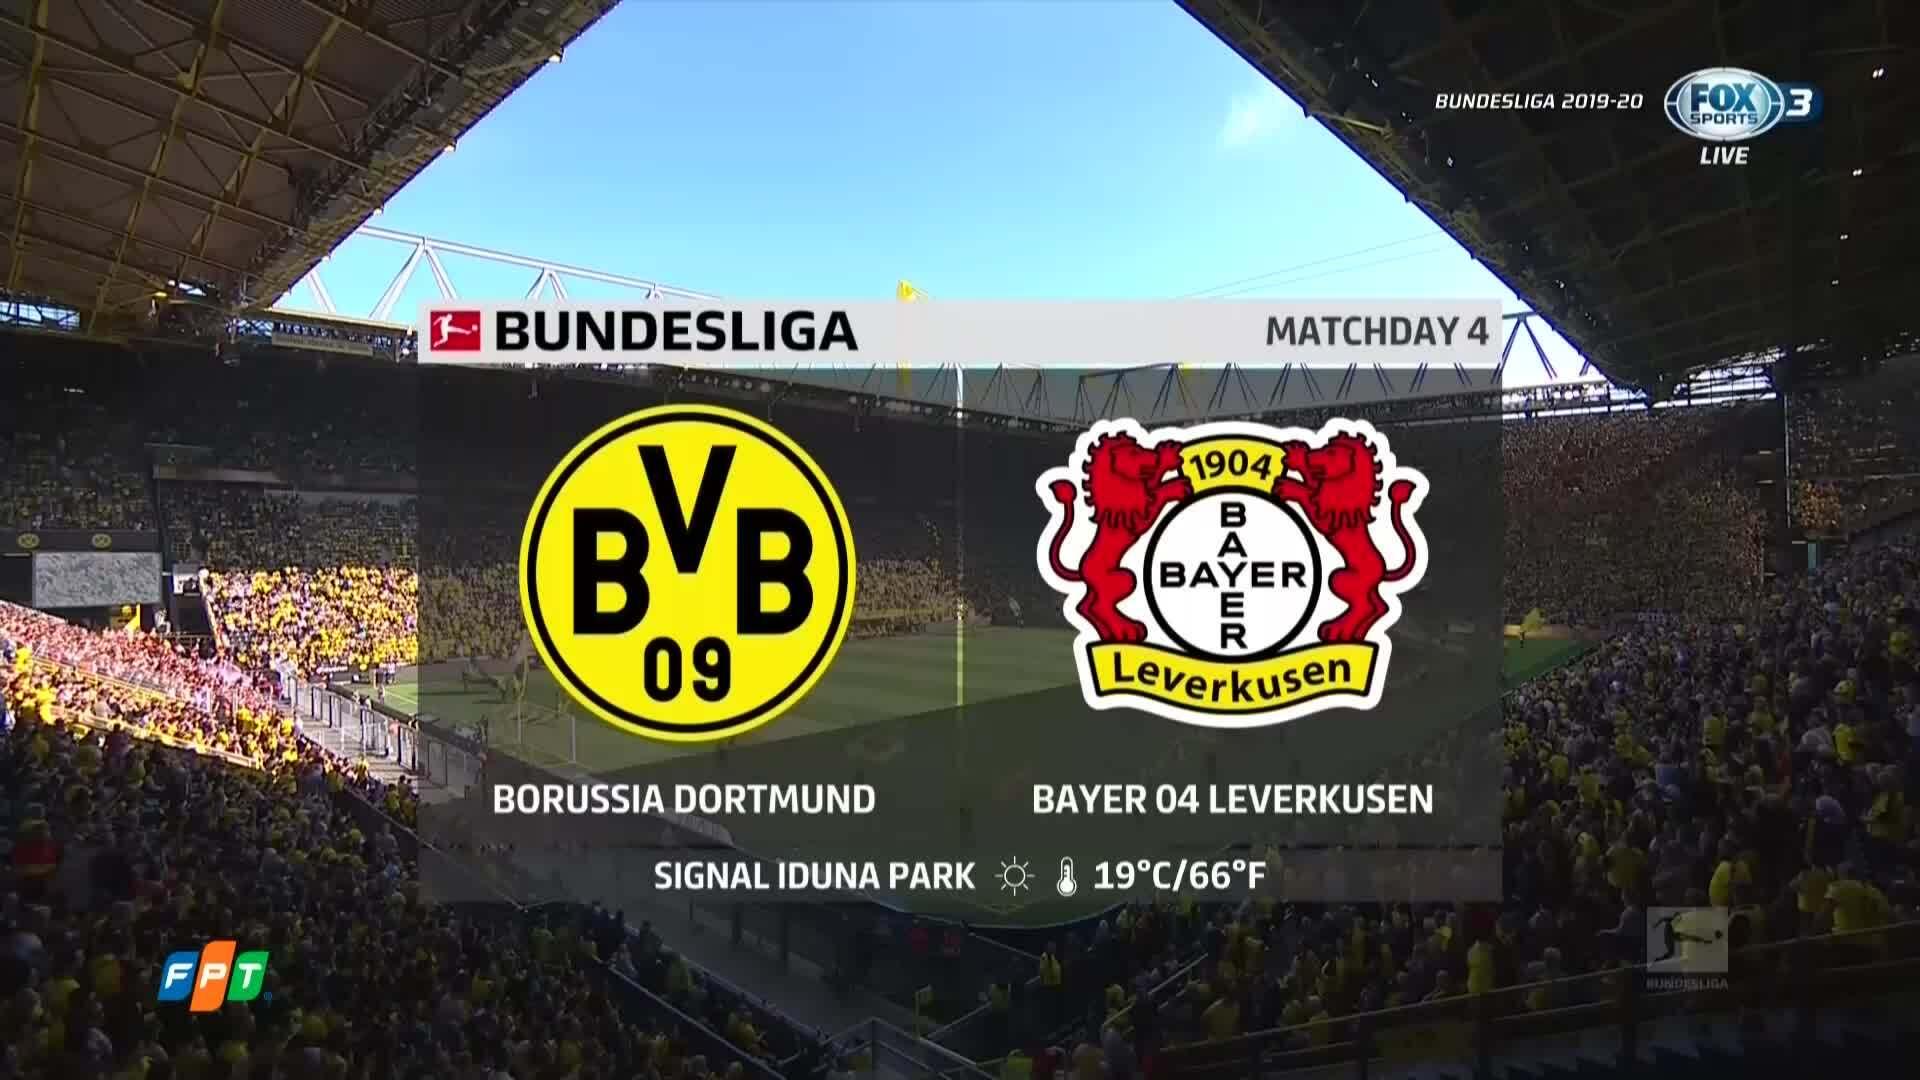 Dortmund 4-0 Leverkusen